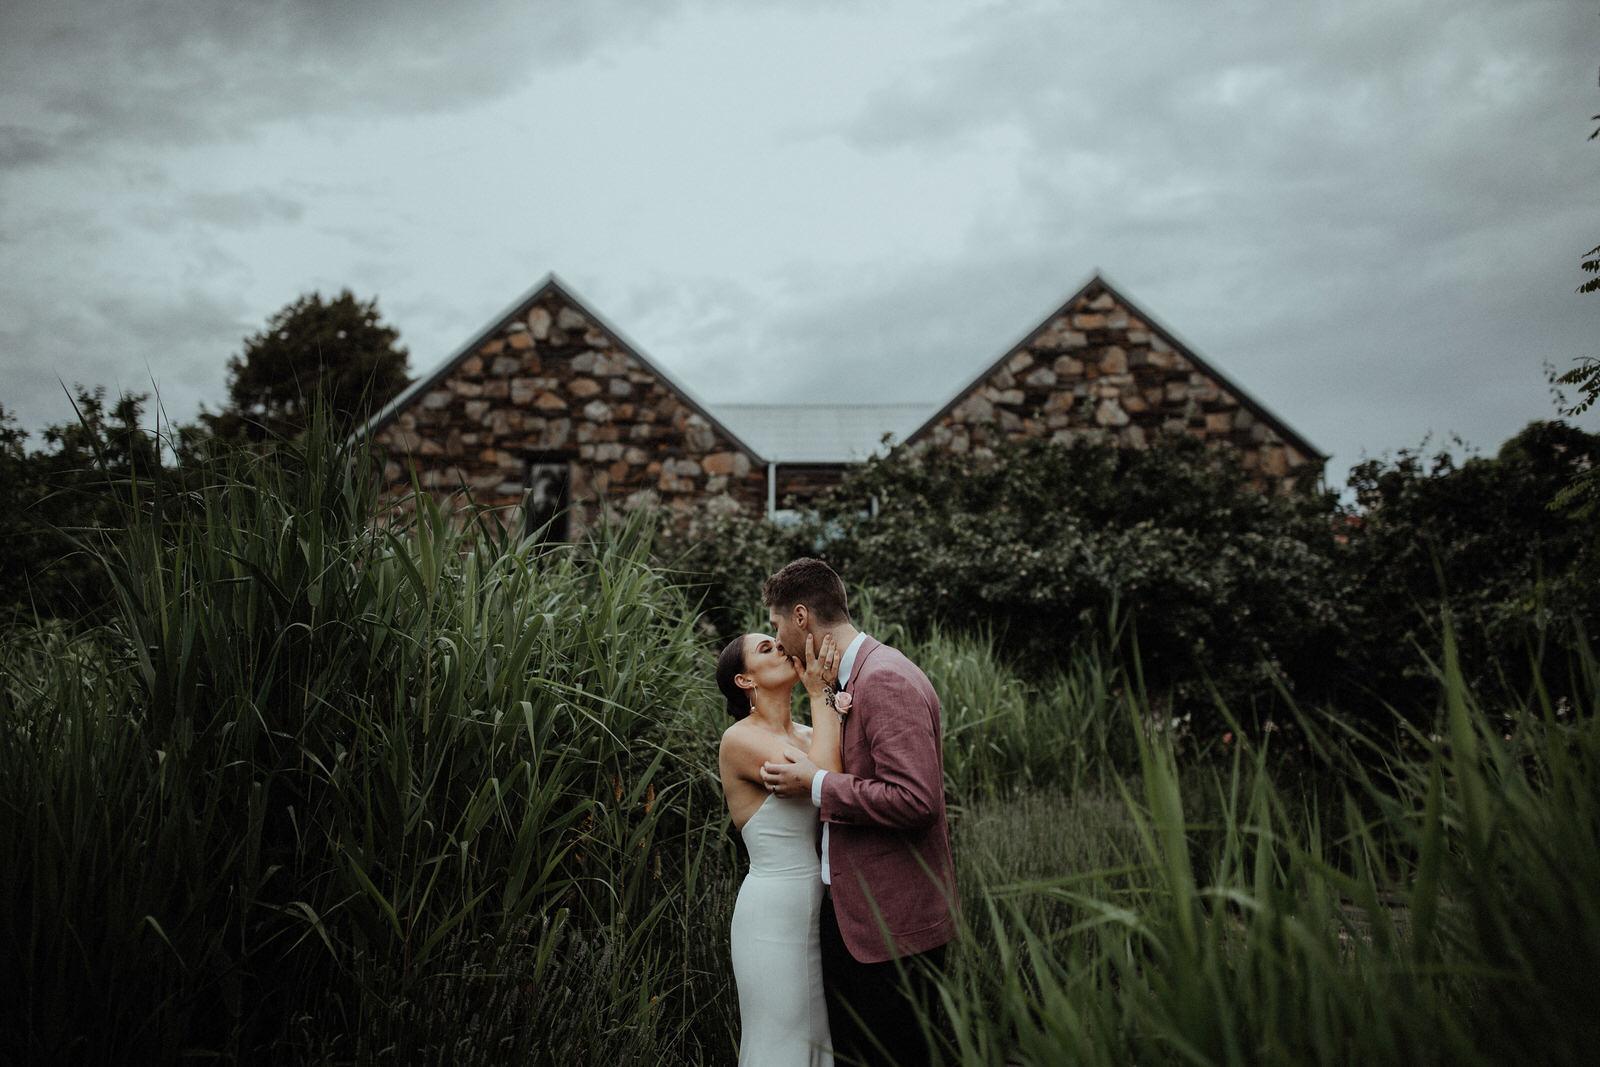 grazing-gundaroo-wedding4.jpg